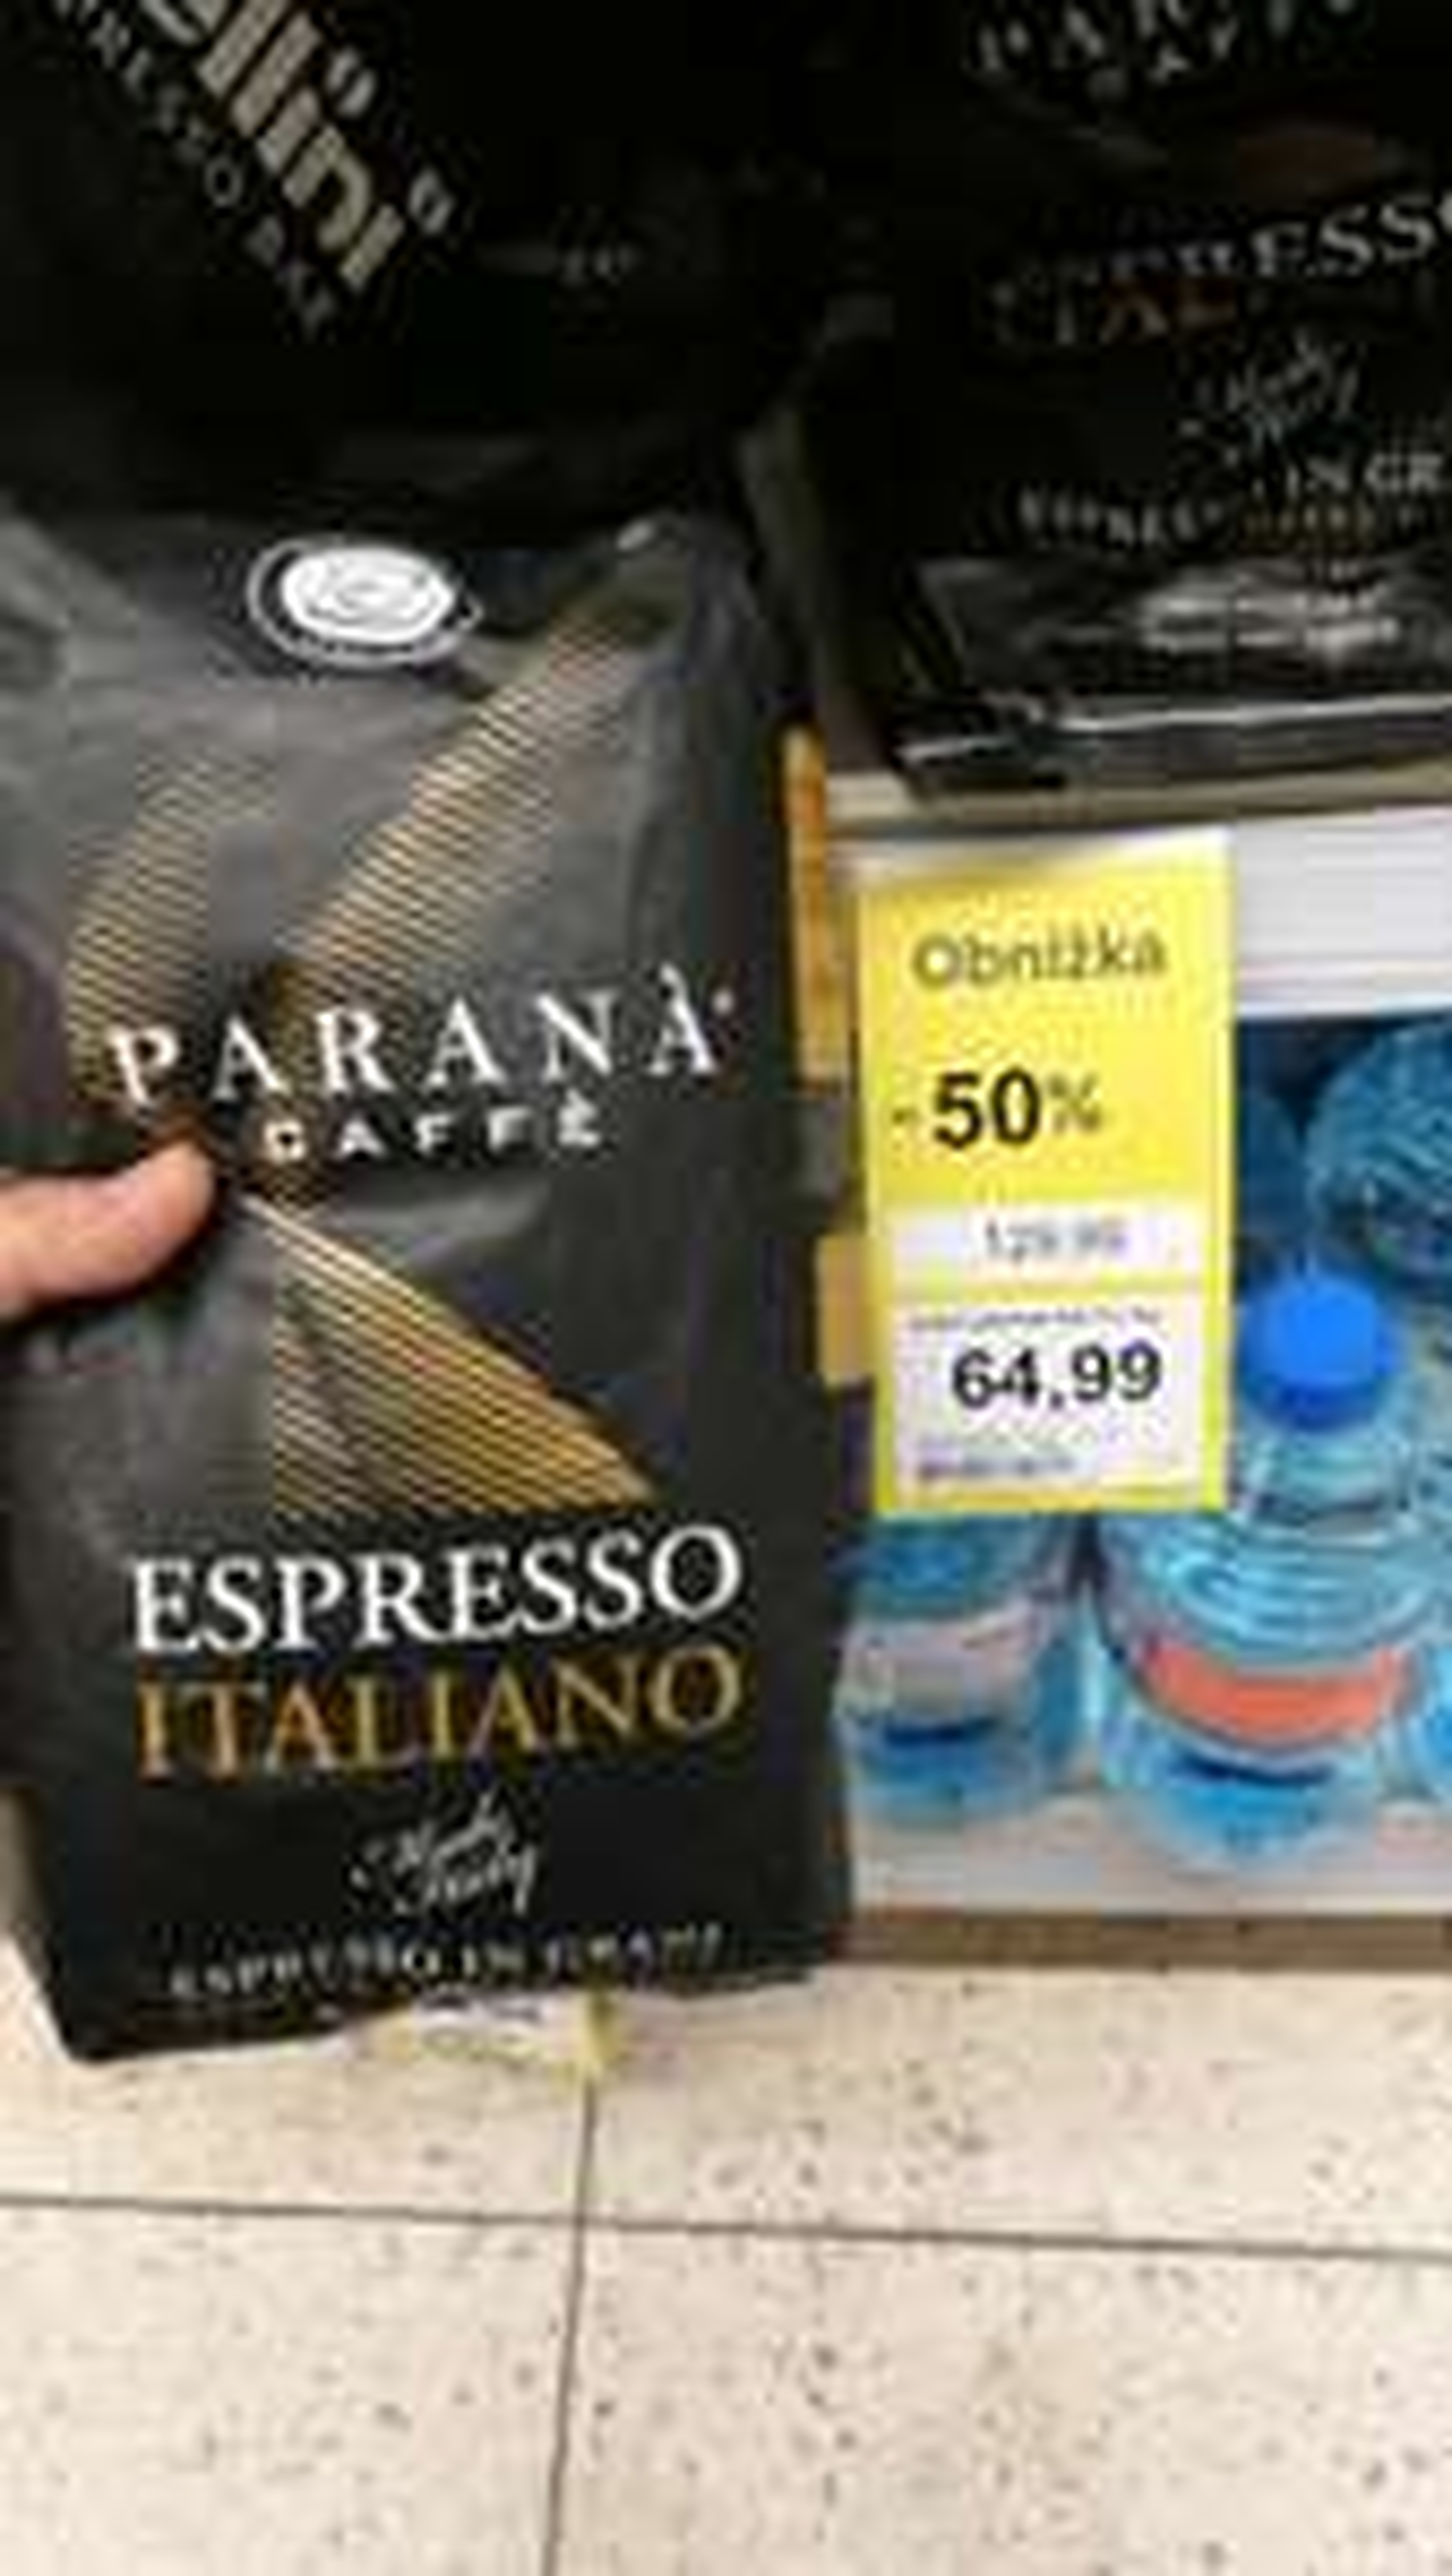 KAWA ZIARNISTA PARANA CAFFE ESPRESSO ITALIANO 1 KG - KAWA NA MEDAL